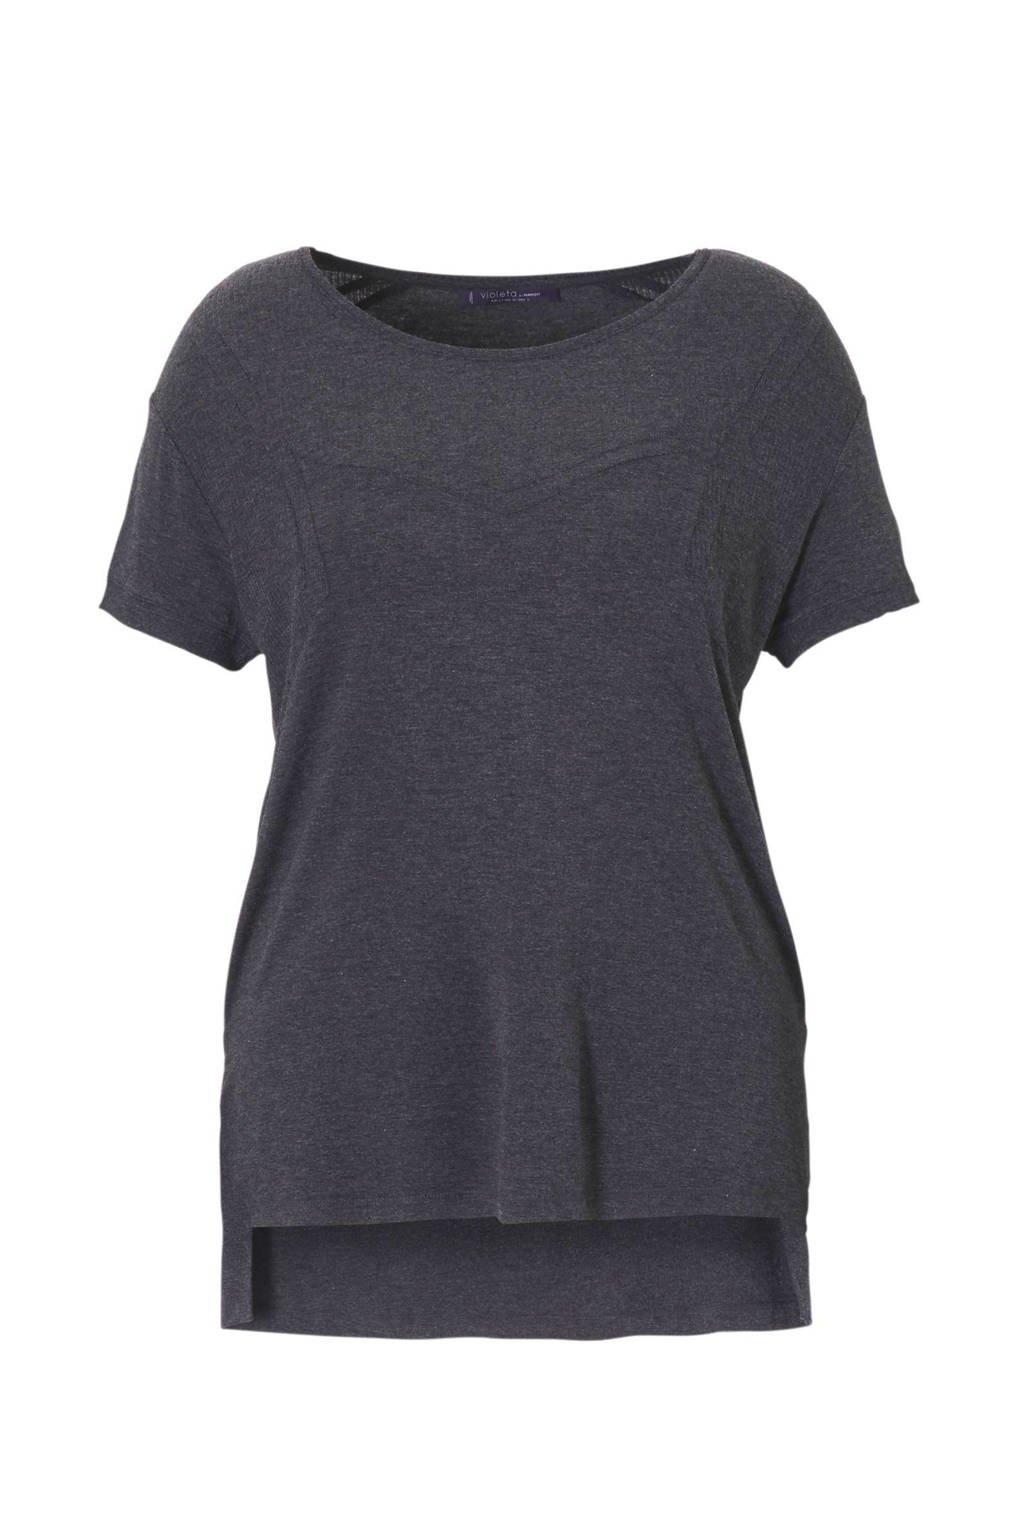 Violeta by Mango T-shirt, Grijs melange